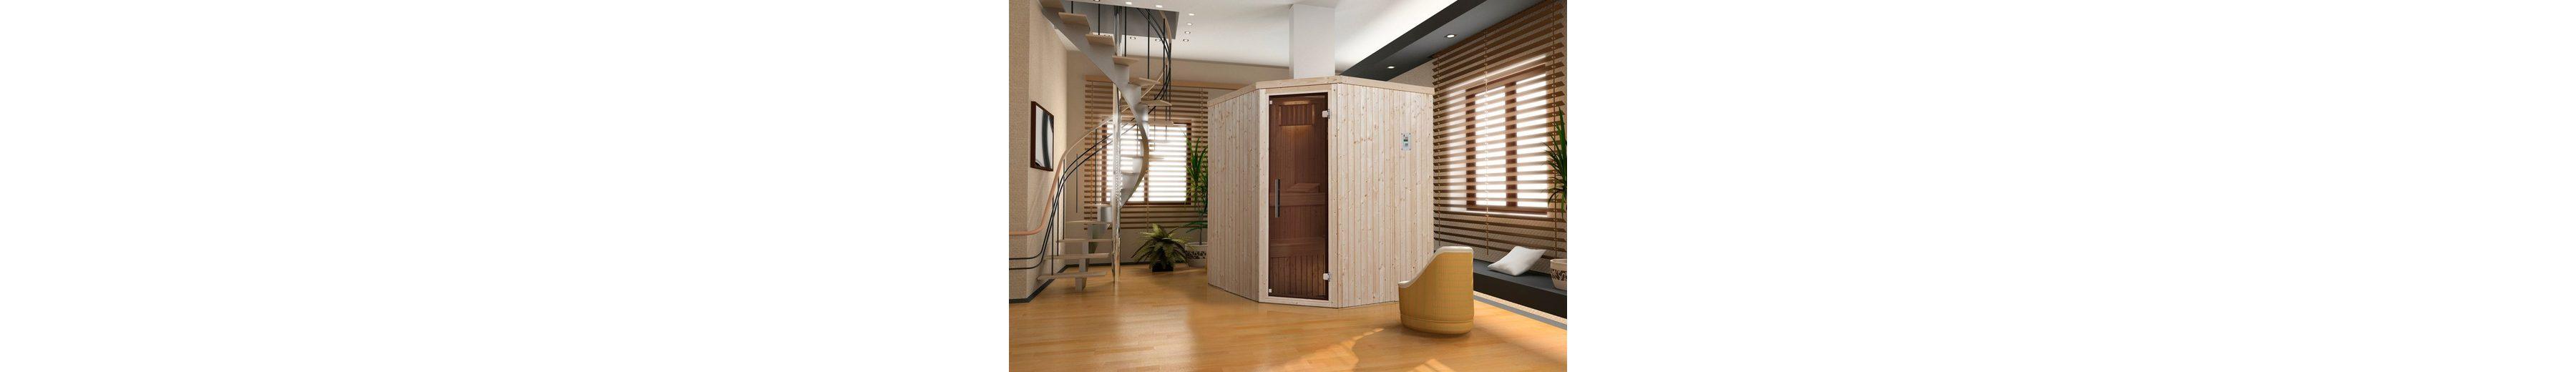 Sauna »Lyngdal 3 Trend Plus OS«, 192/175/199 cm, 68 mm, 7,5-KW-Ofen